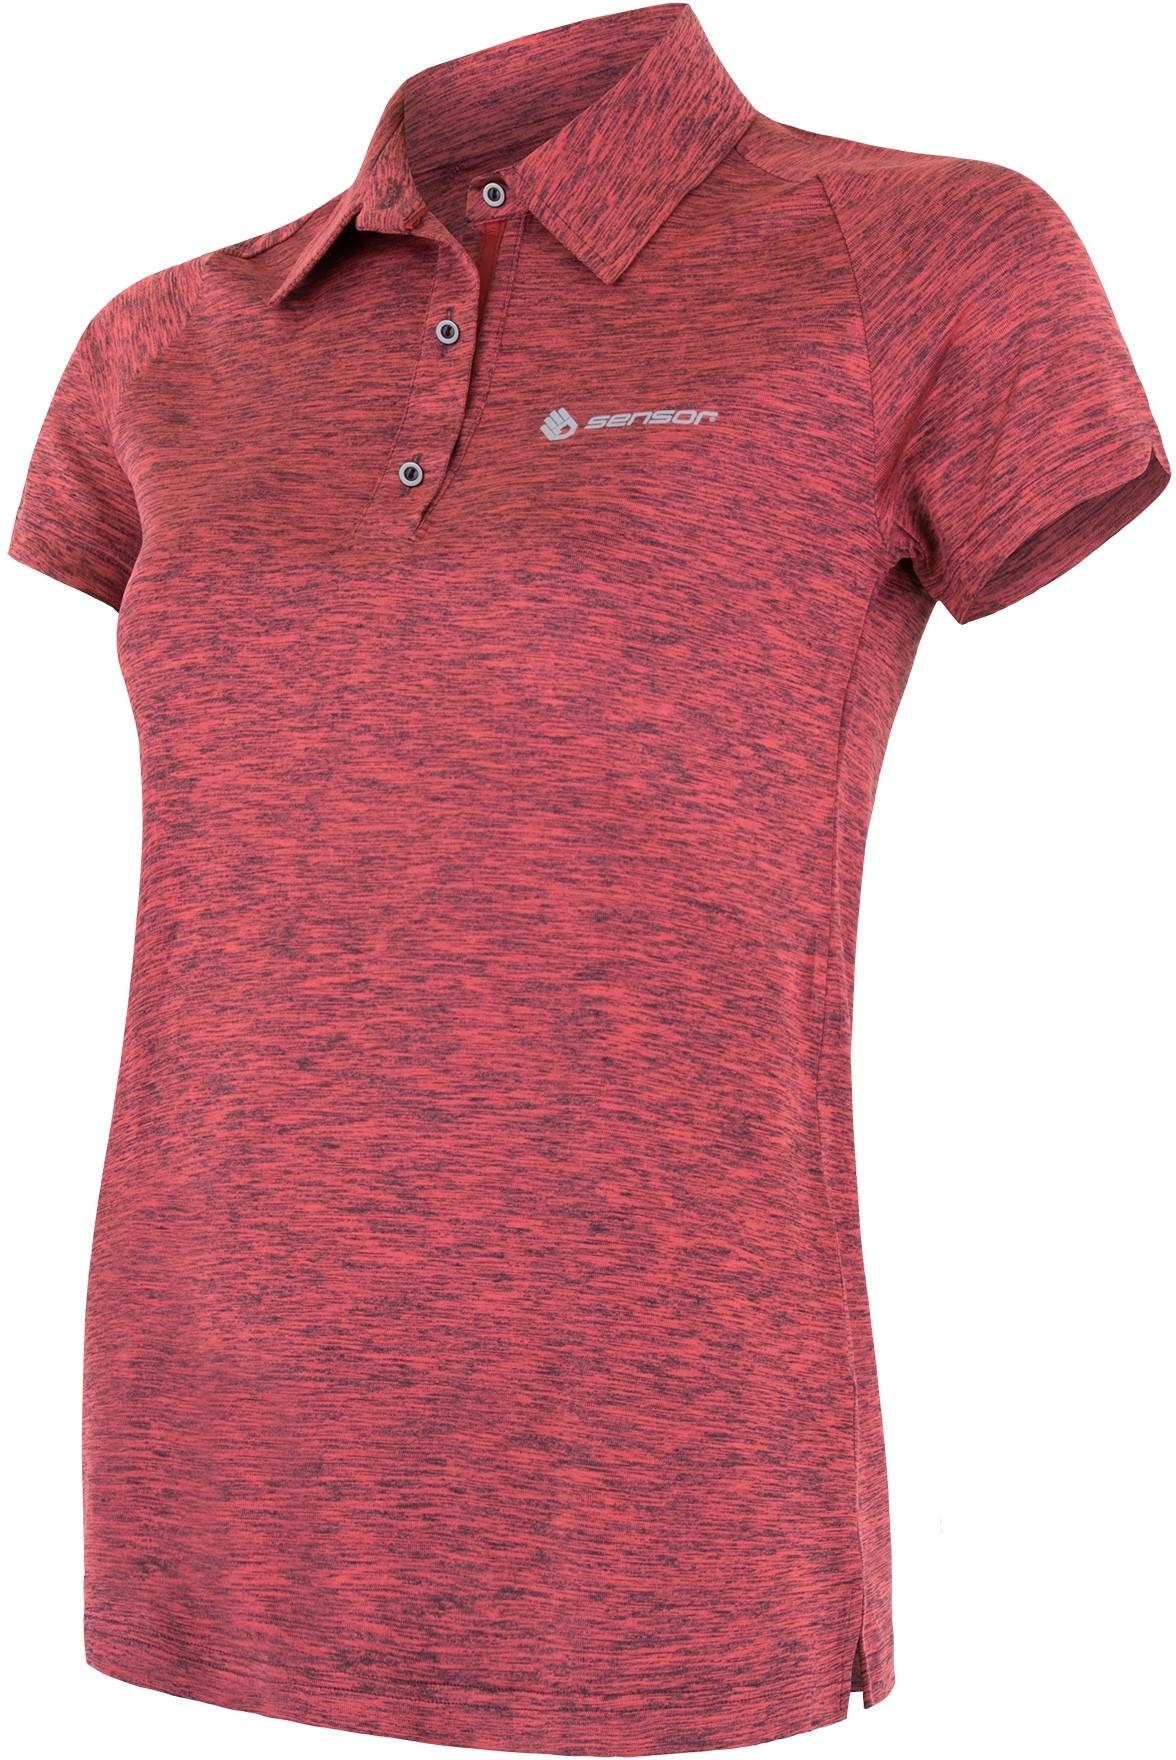 Sensor t shirt damski polo Motion różowy S